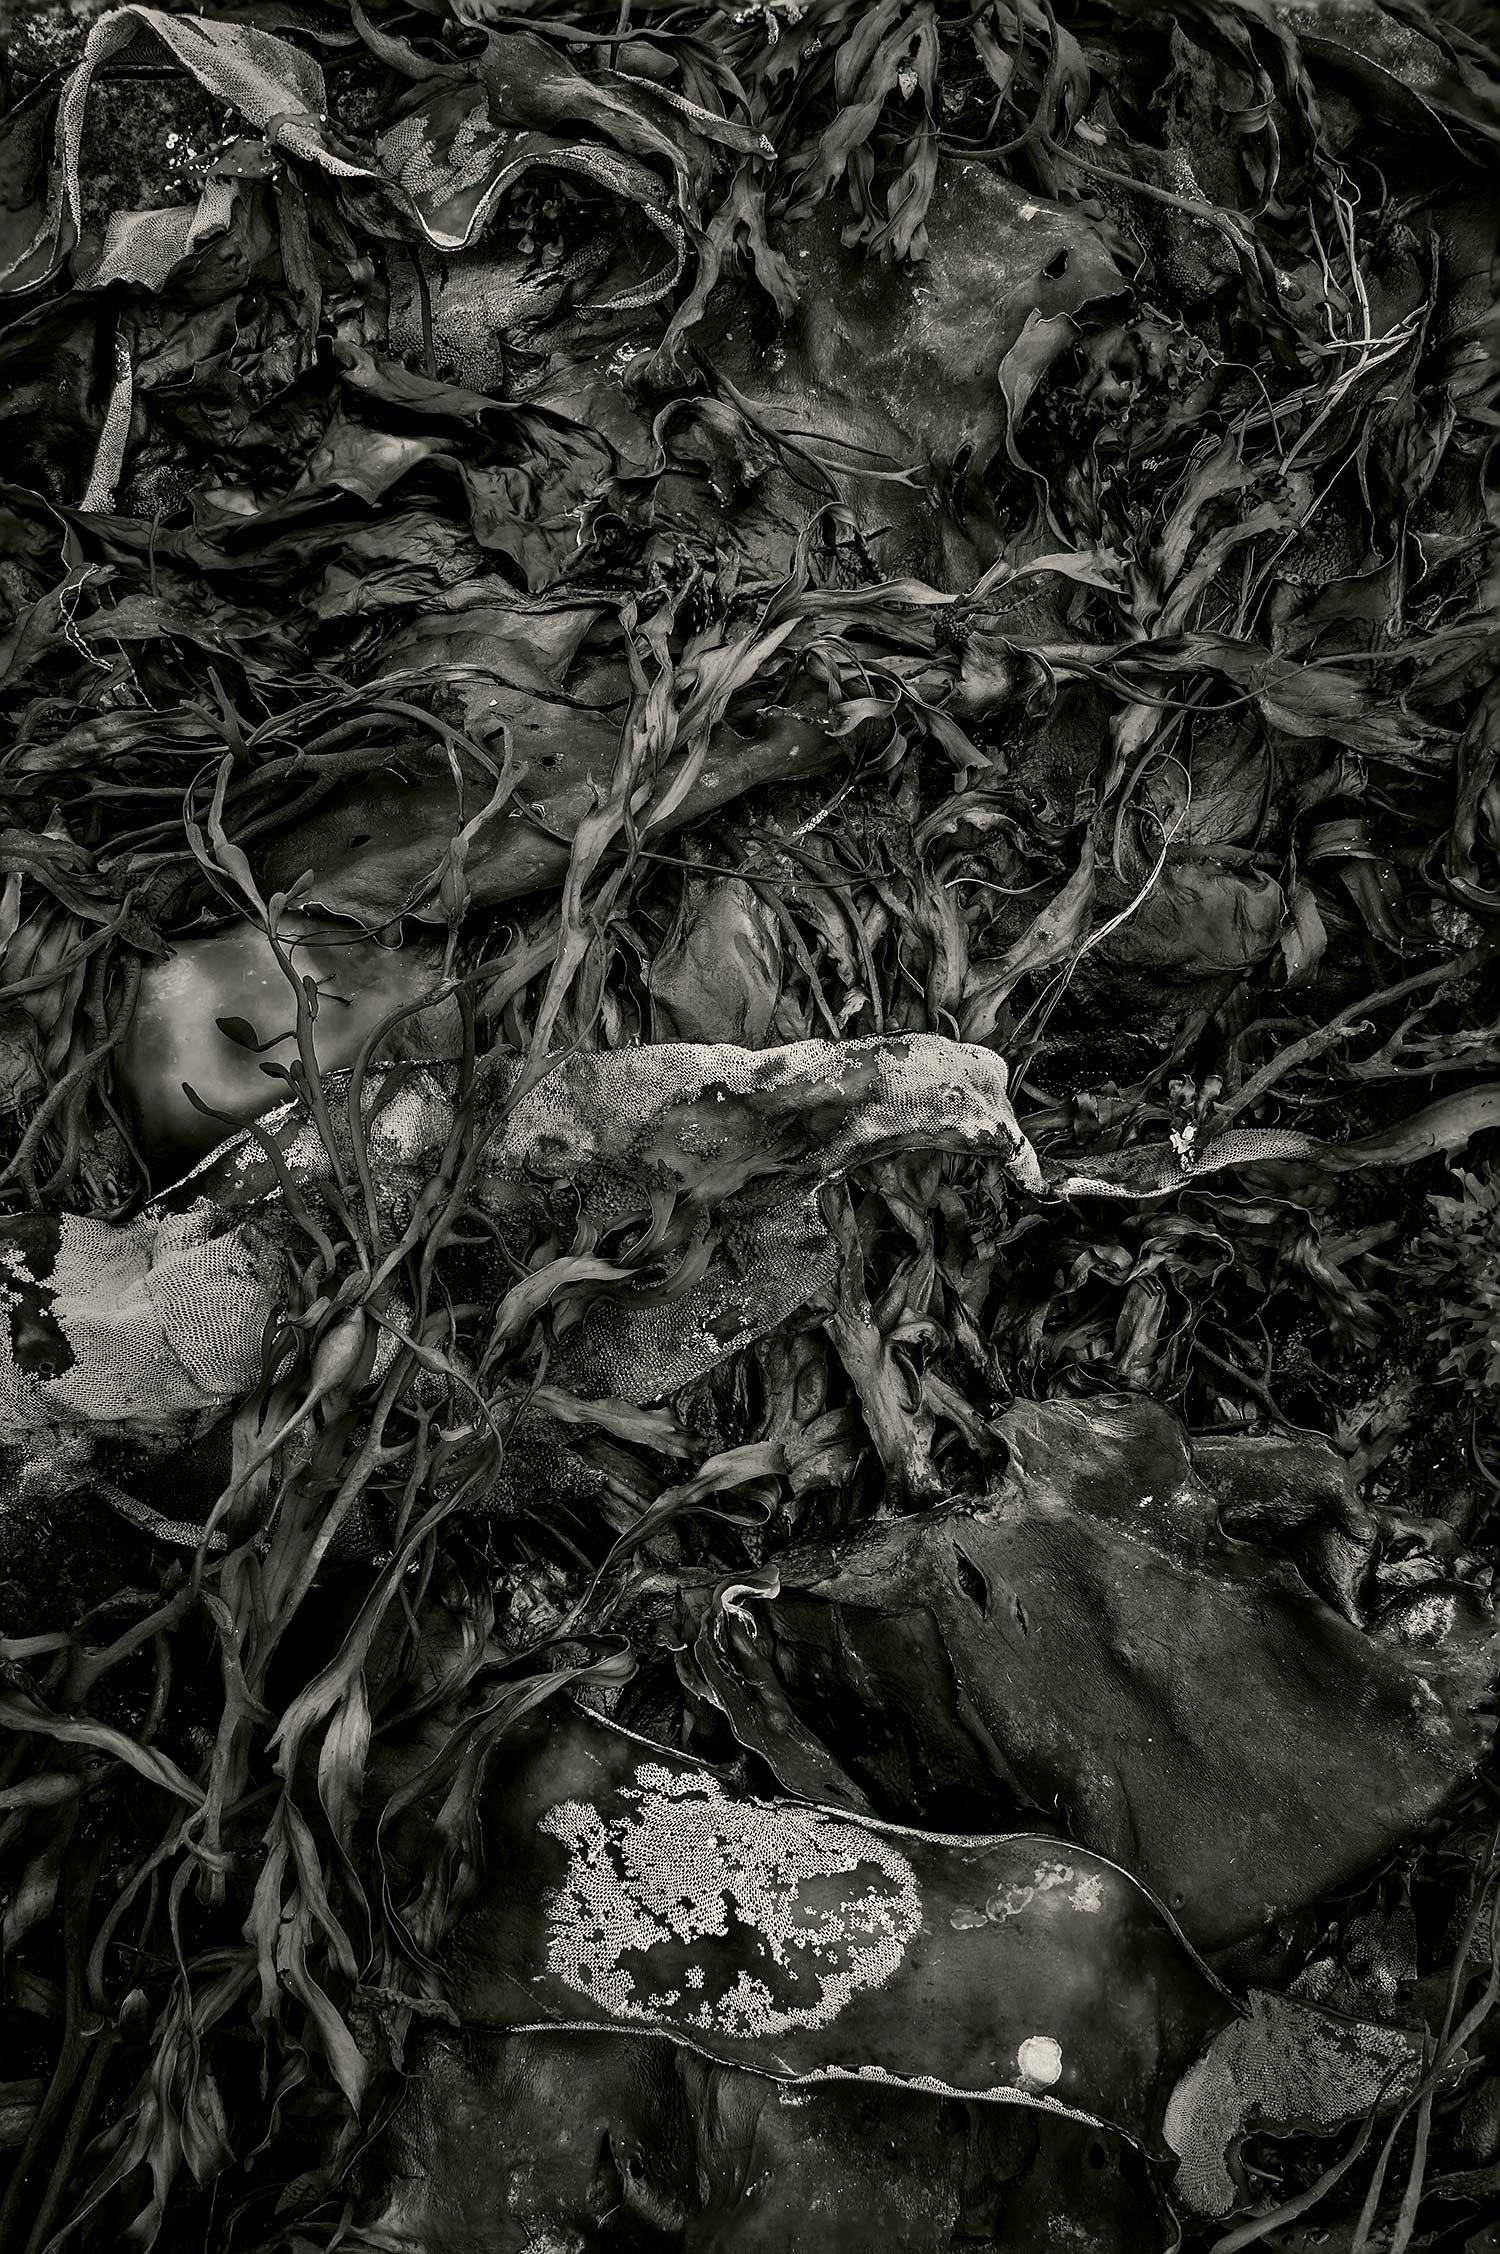 Seaweed 578, Seawall, Maine, 2012